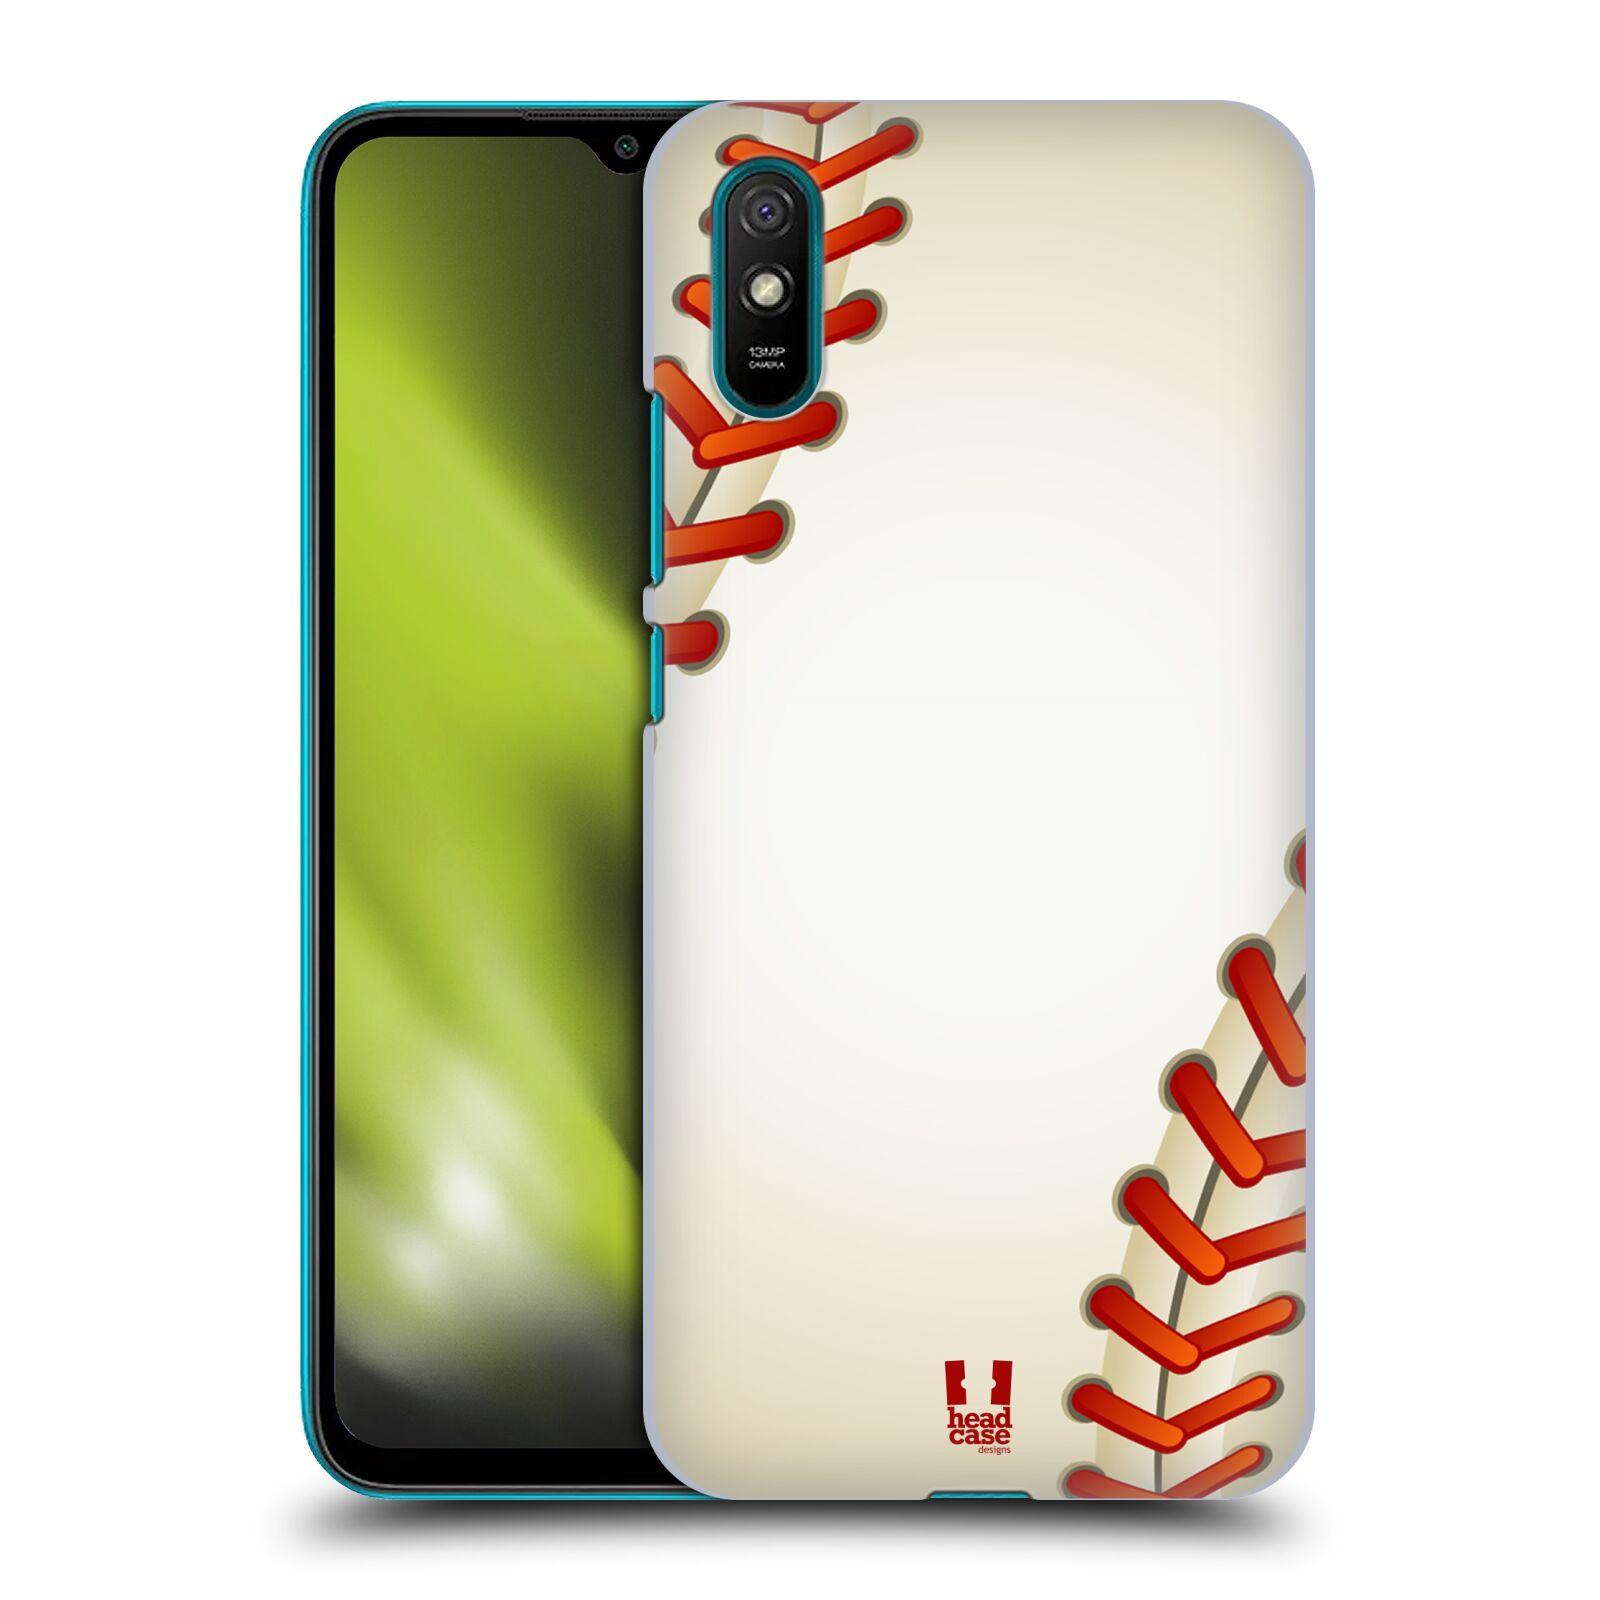 Plastové pouzdro na mobil Xiaomi Redmi 9A / Xiaomi Redmi 9AT - Head Case - Baseballový míček